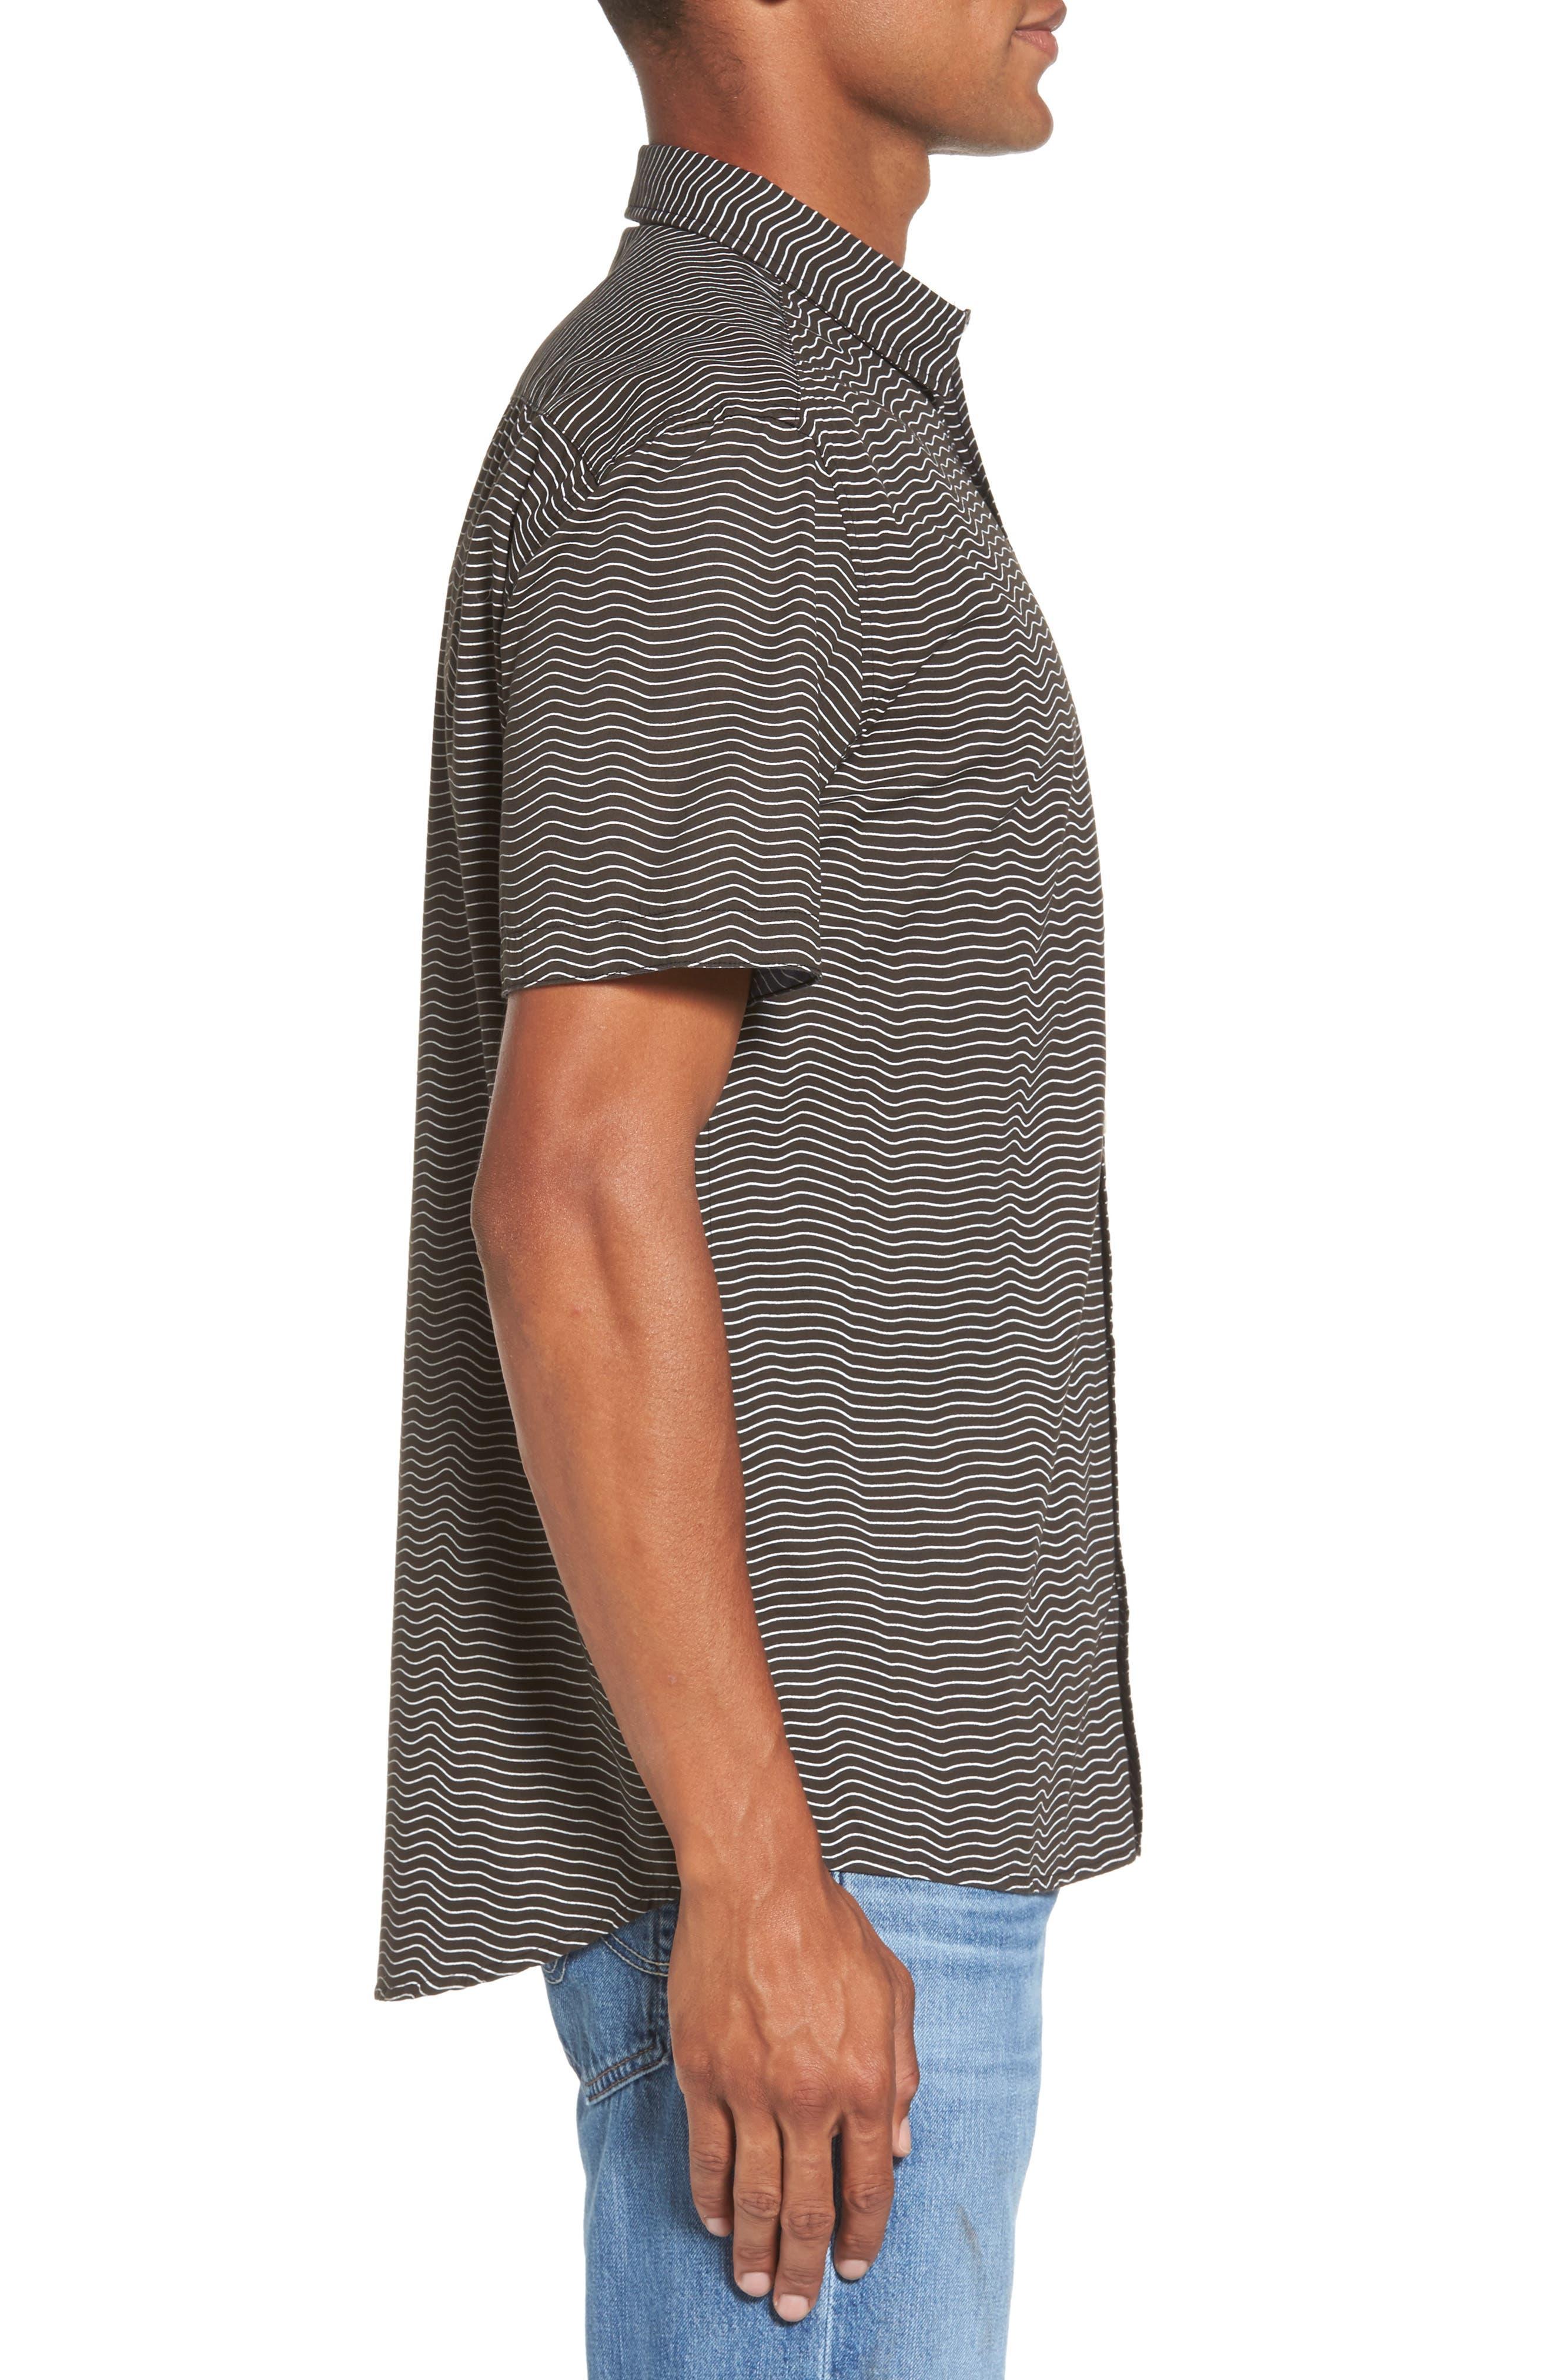 Heat Wave Stripe Shirt,                             Alternate thumbnail 3, color,                             002